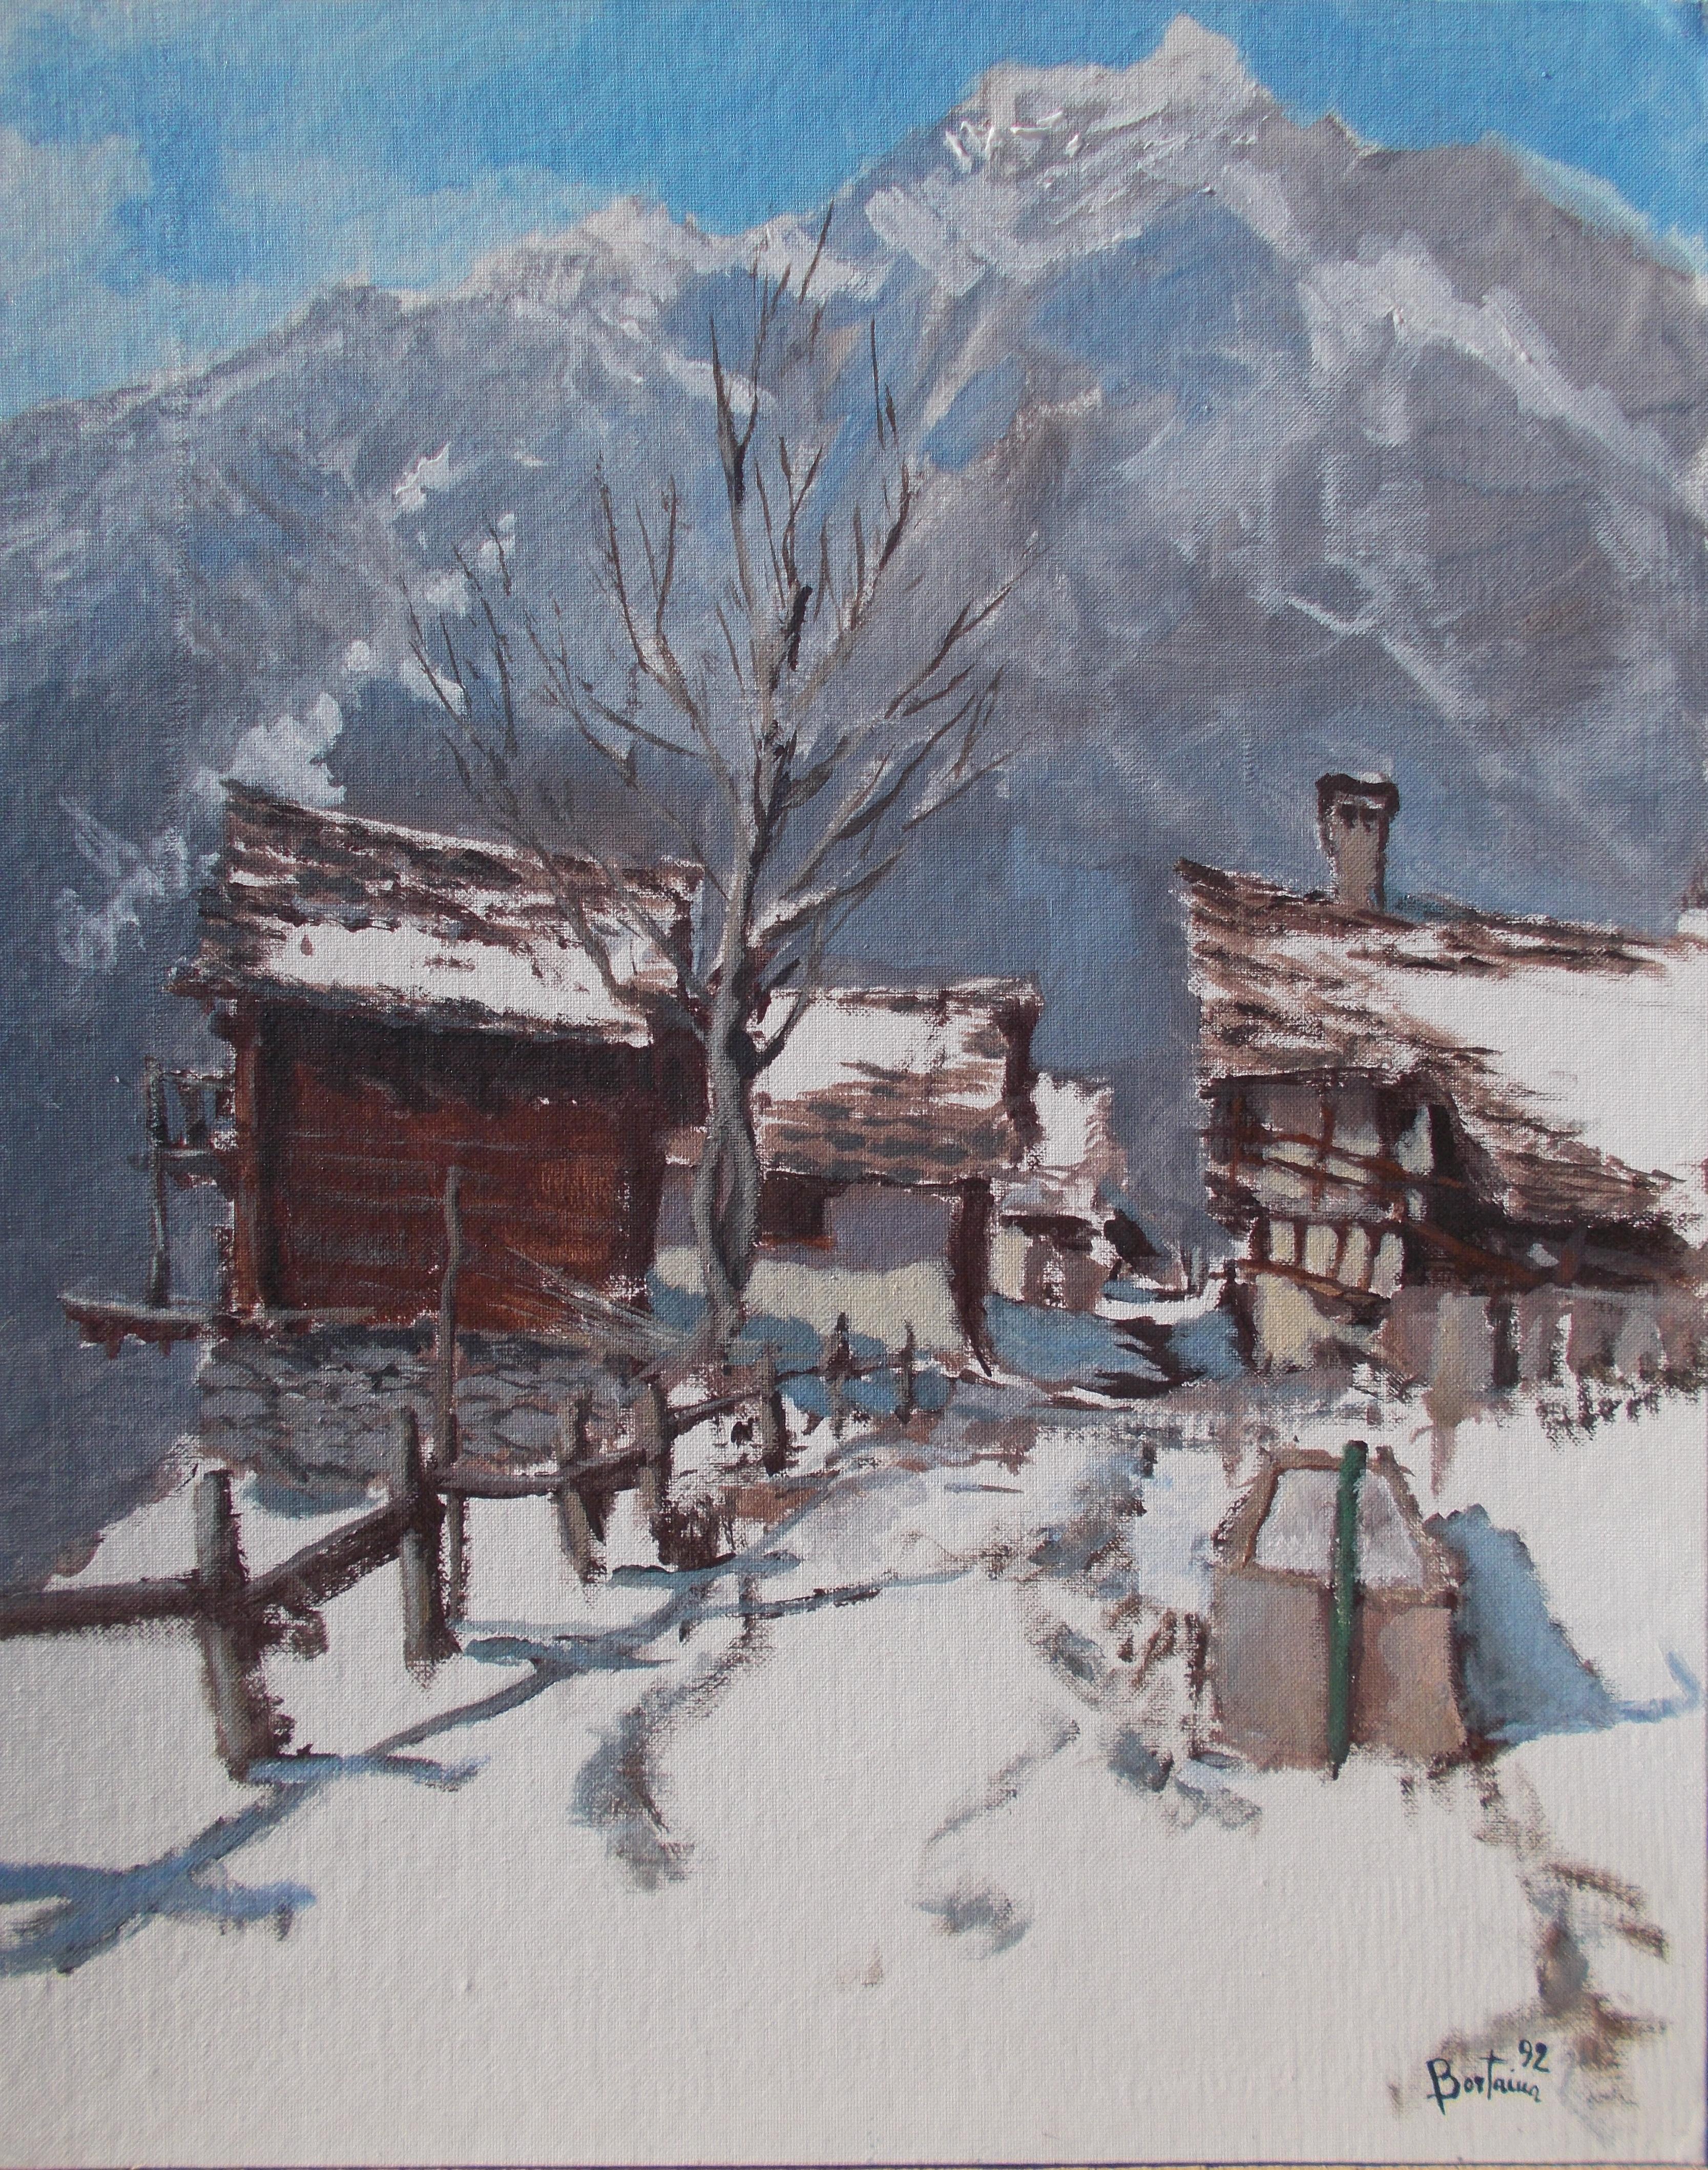 Loz, ultima nevicata